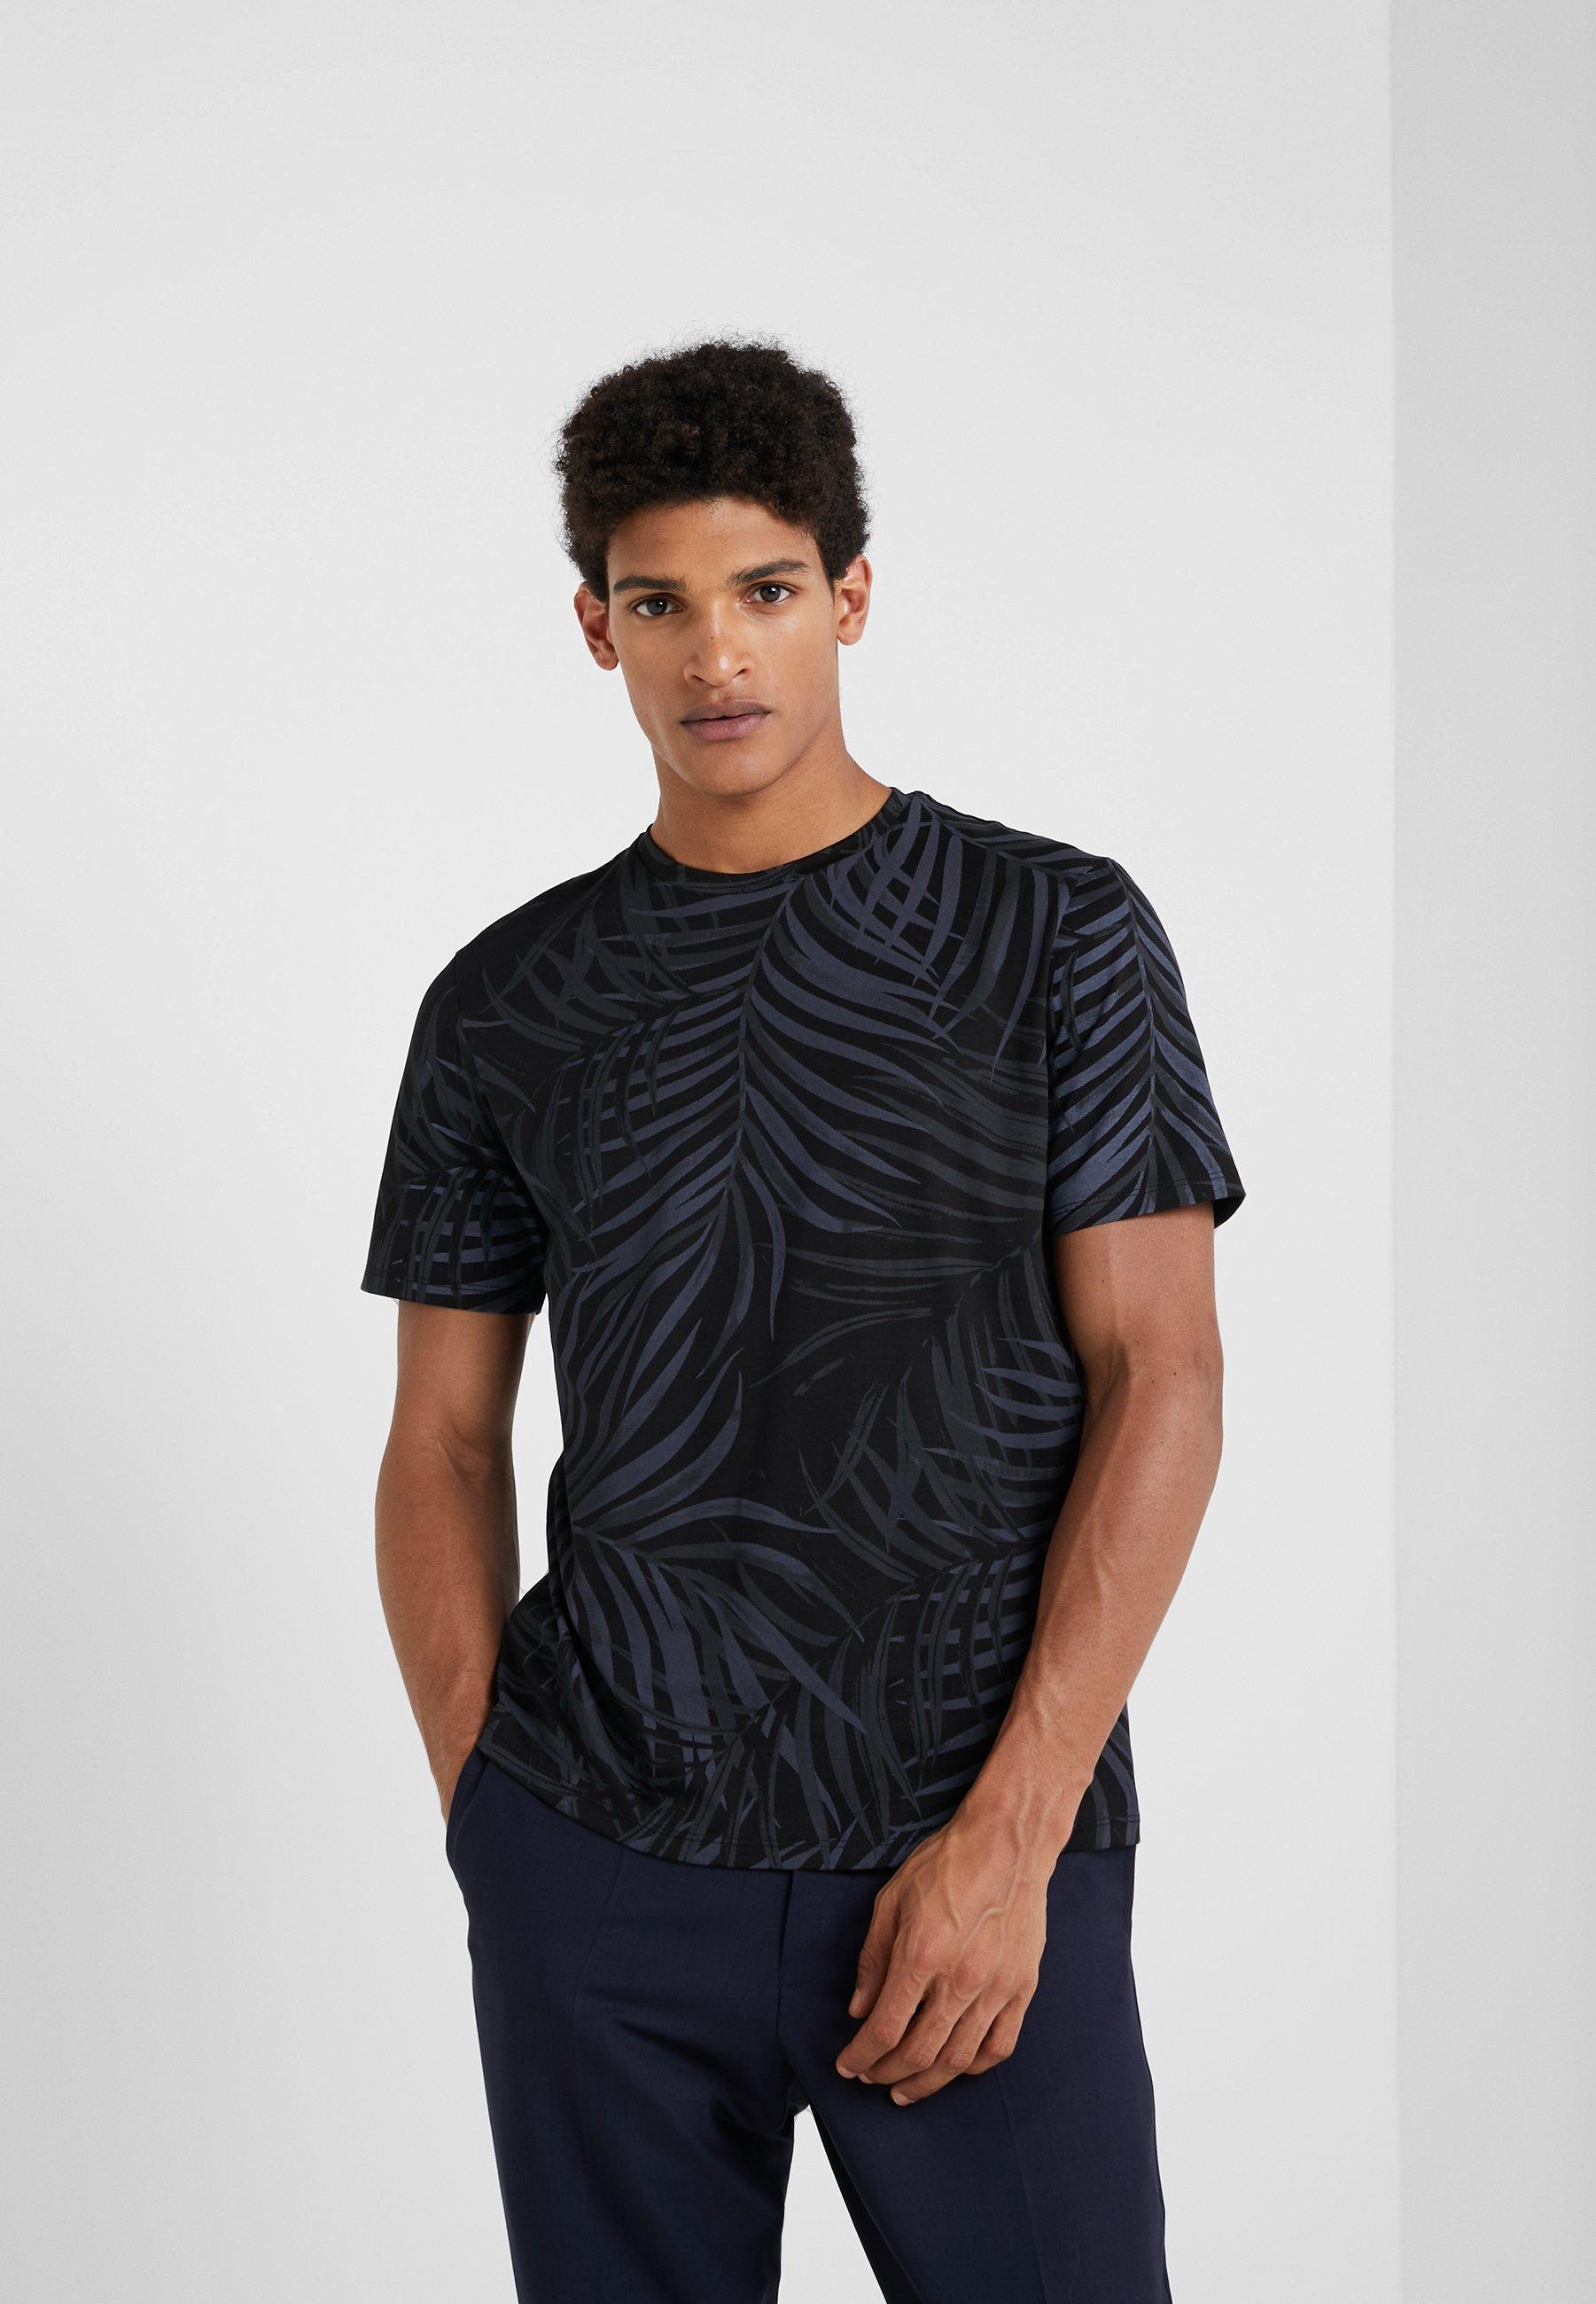 Imprimé Tee SaygojersT Clean Eclipse Theory shirt QrxoCBhtsd